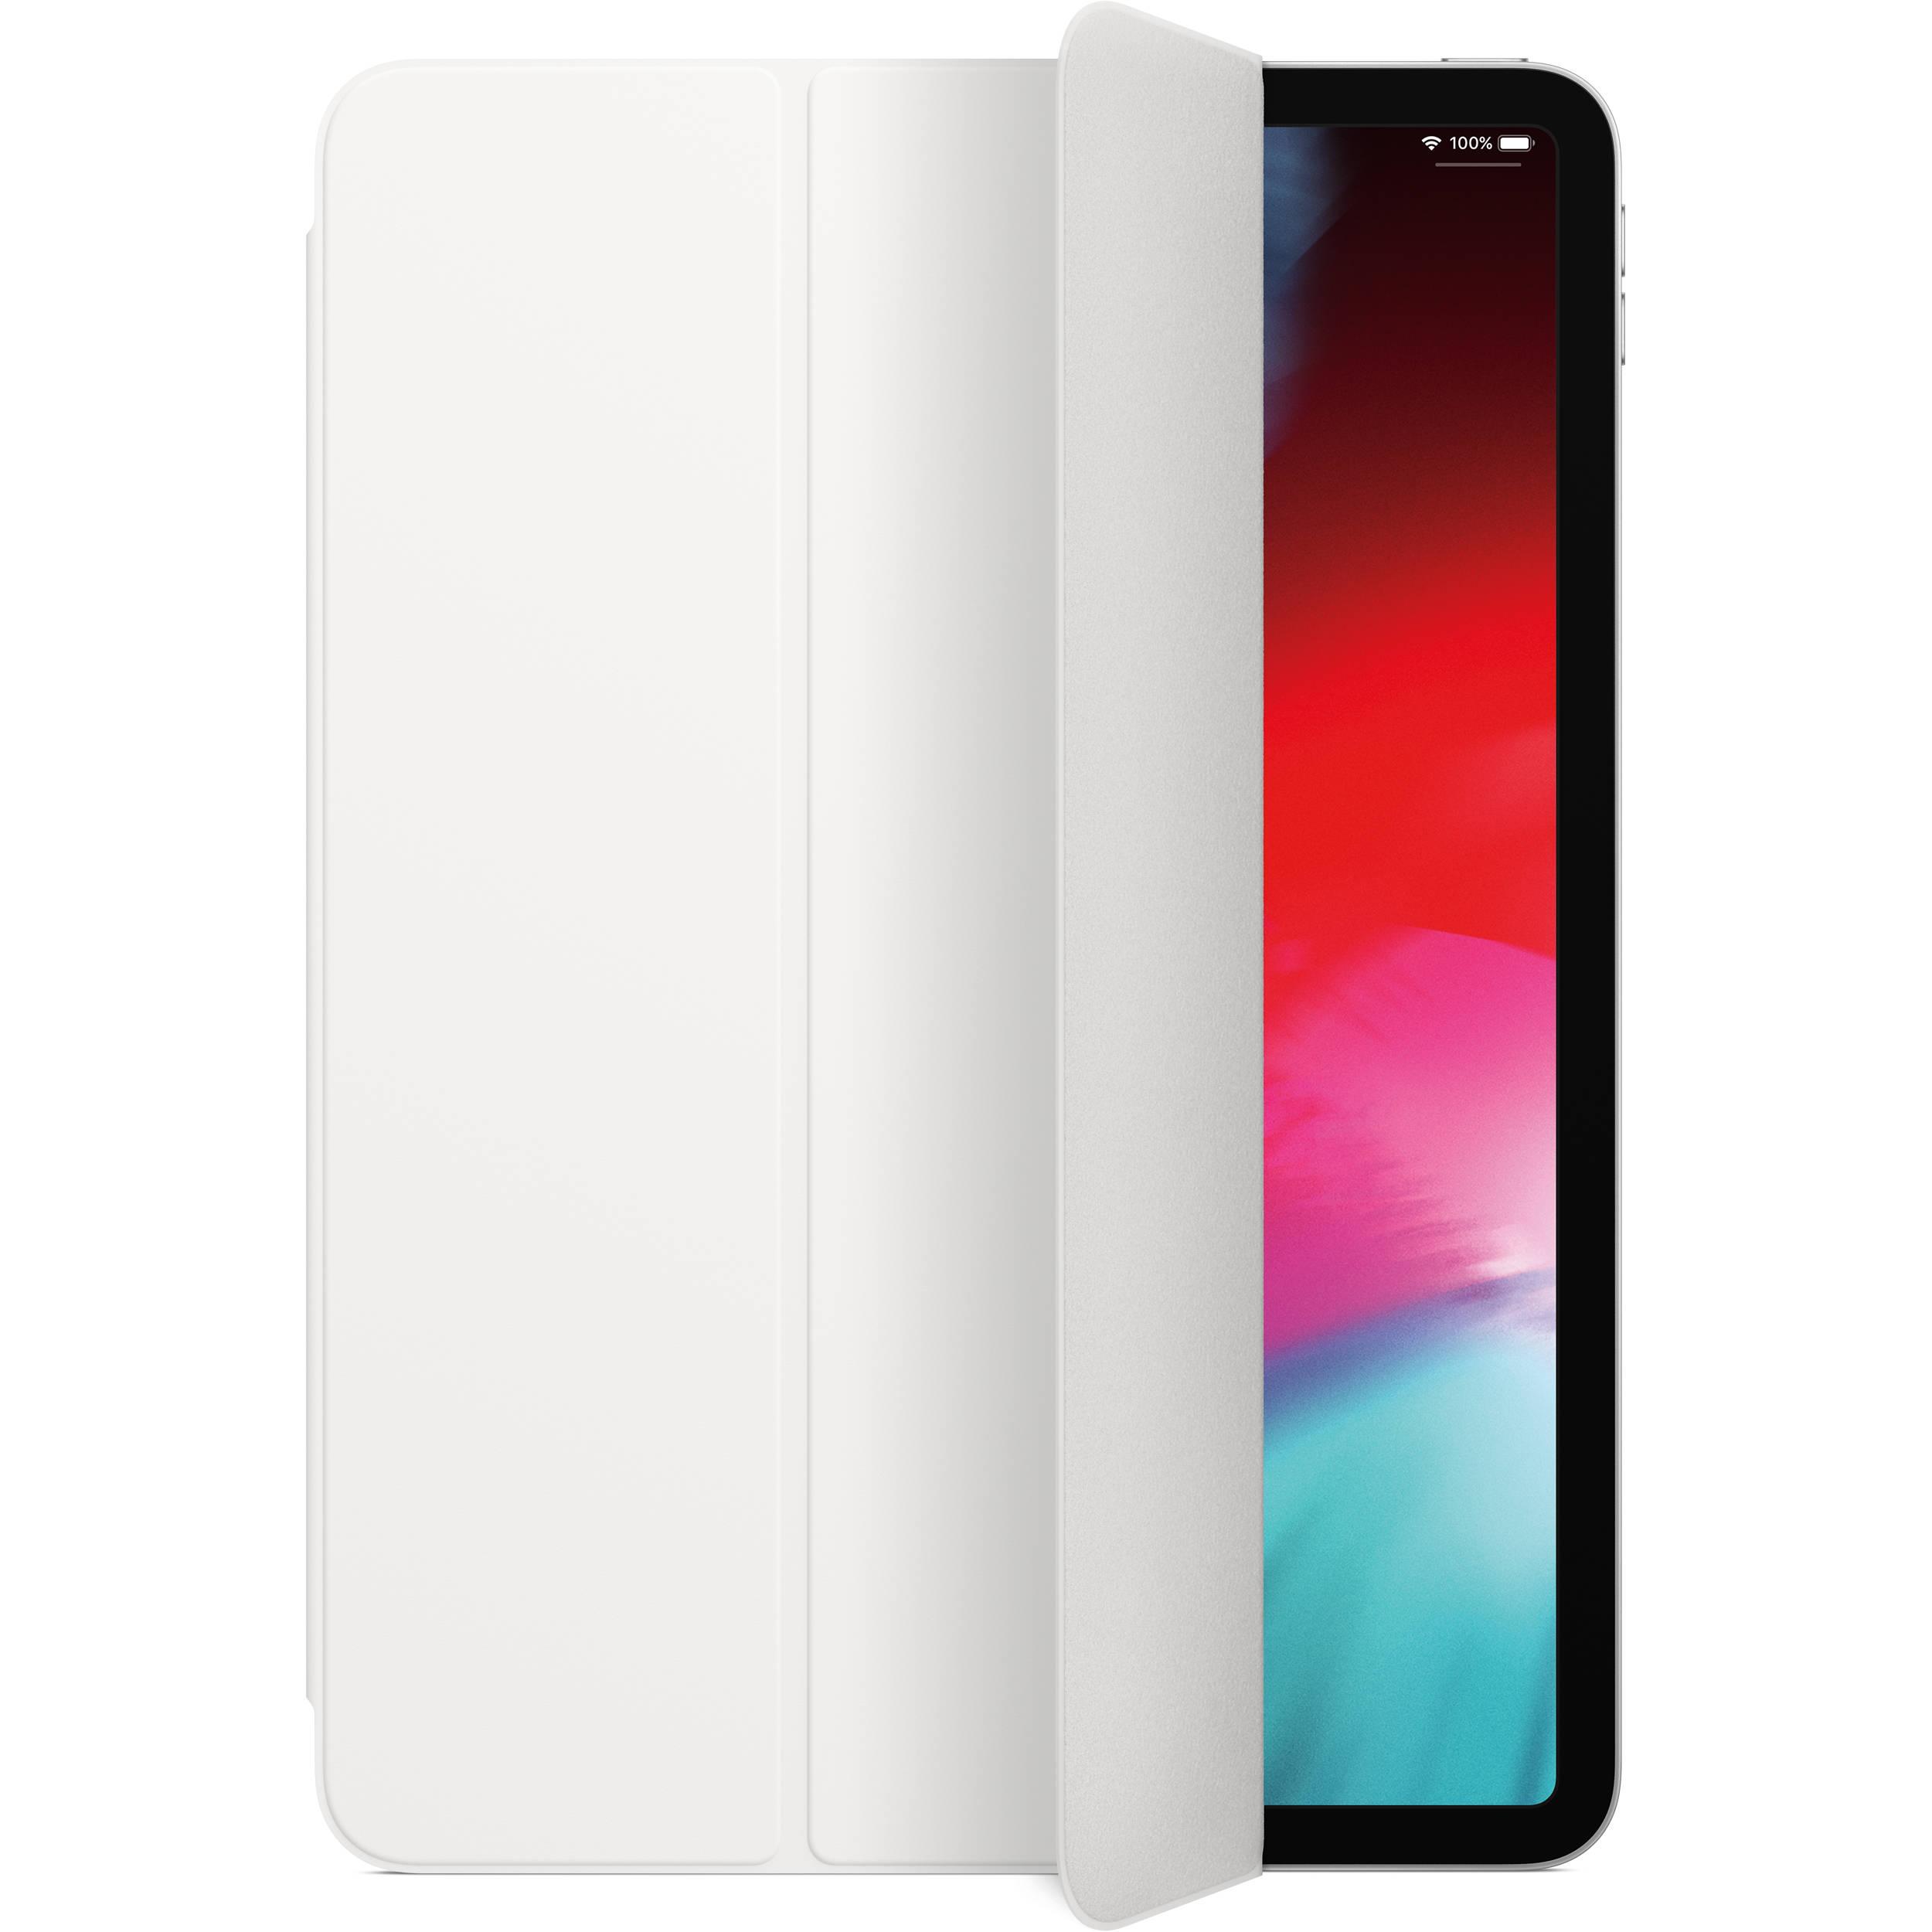 Купить Чехол Apple Smart Folio для iPad Pro 11 (MRX82ZM/A) (полиуретан с подставкой) (white)